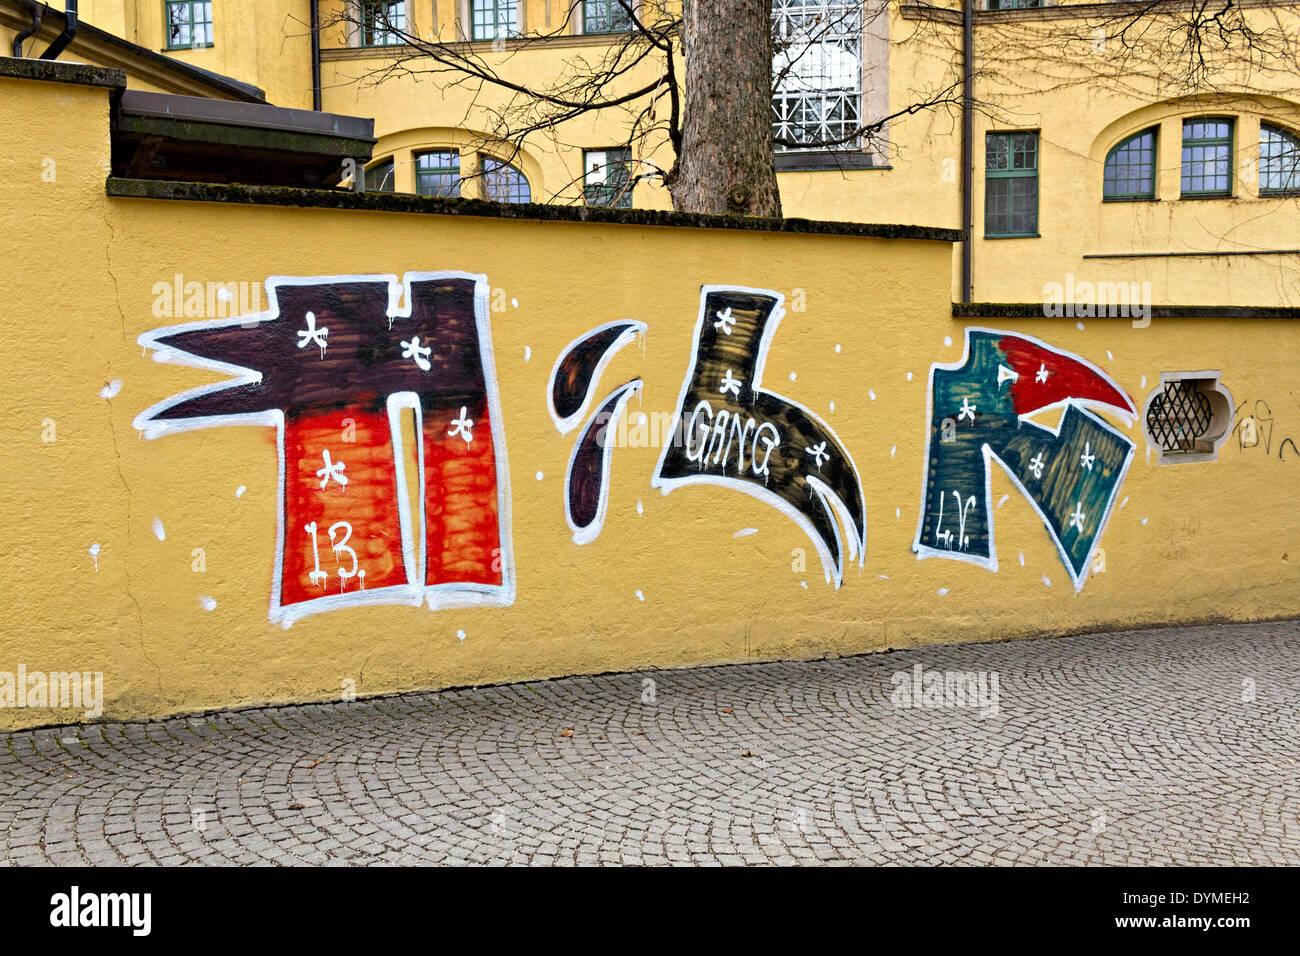 Munich Street Art Graffiti Stock Photos & Munich Street Art Graffiti ...